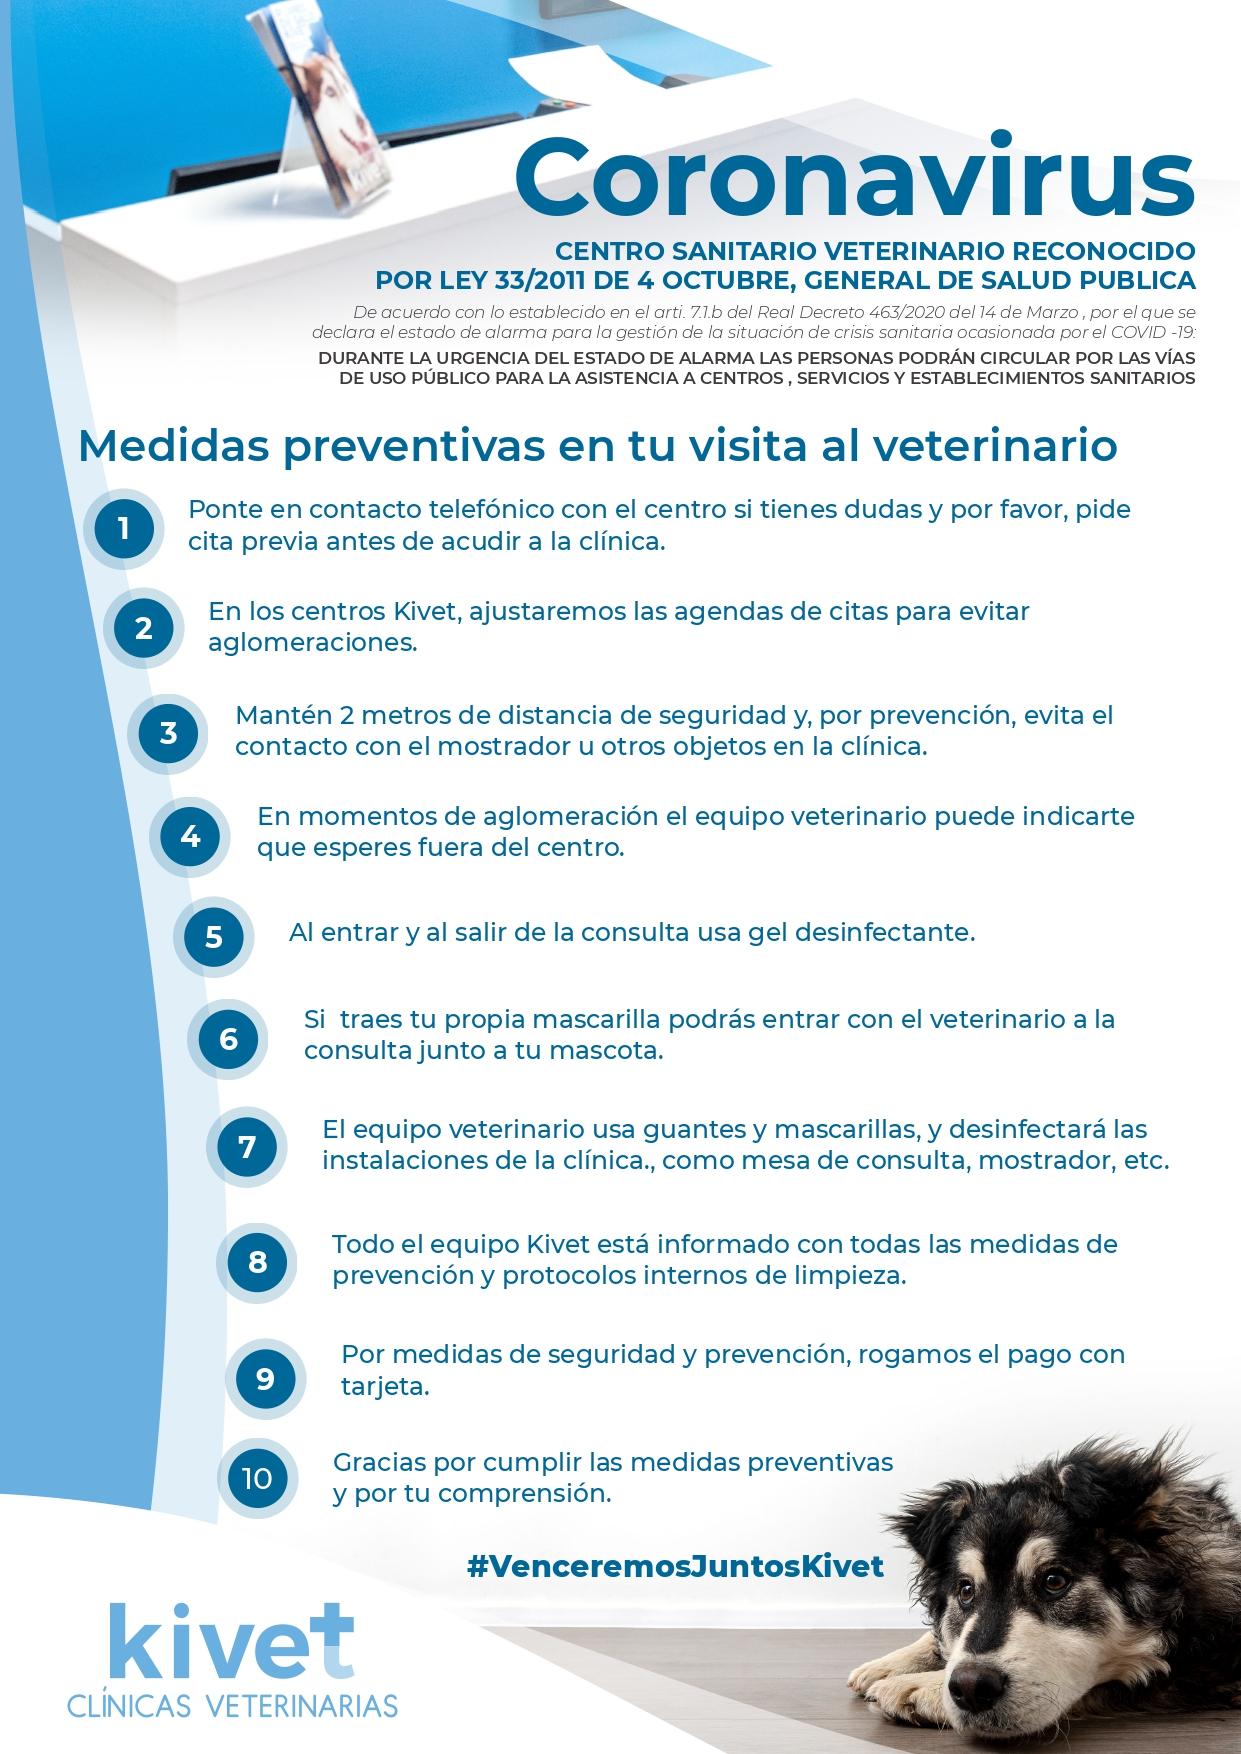 Medidas de prevención coronavirus